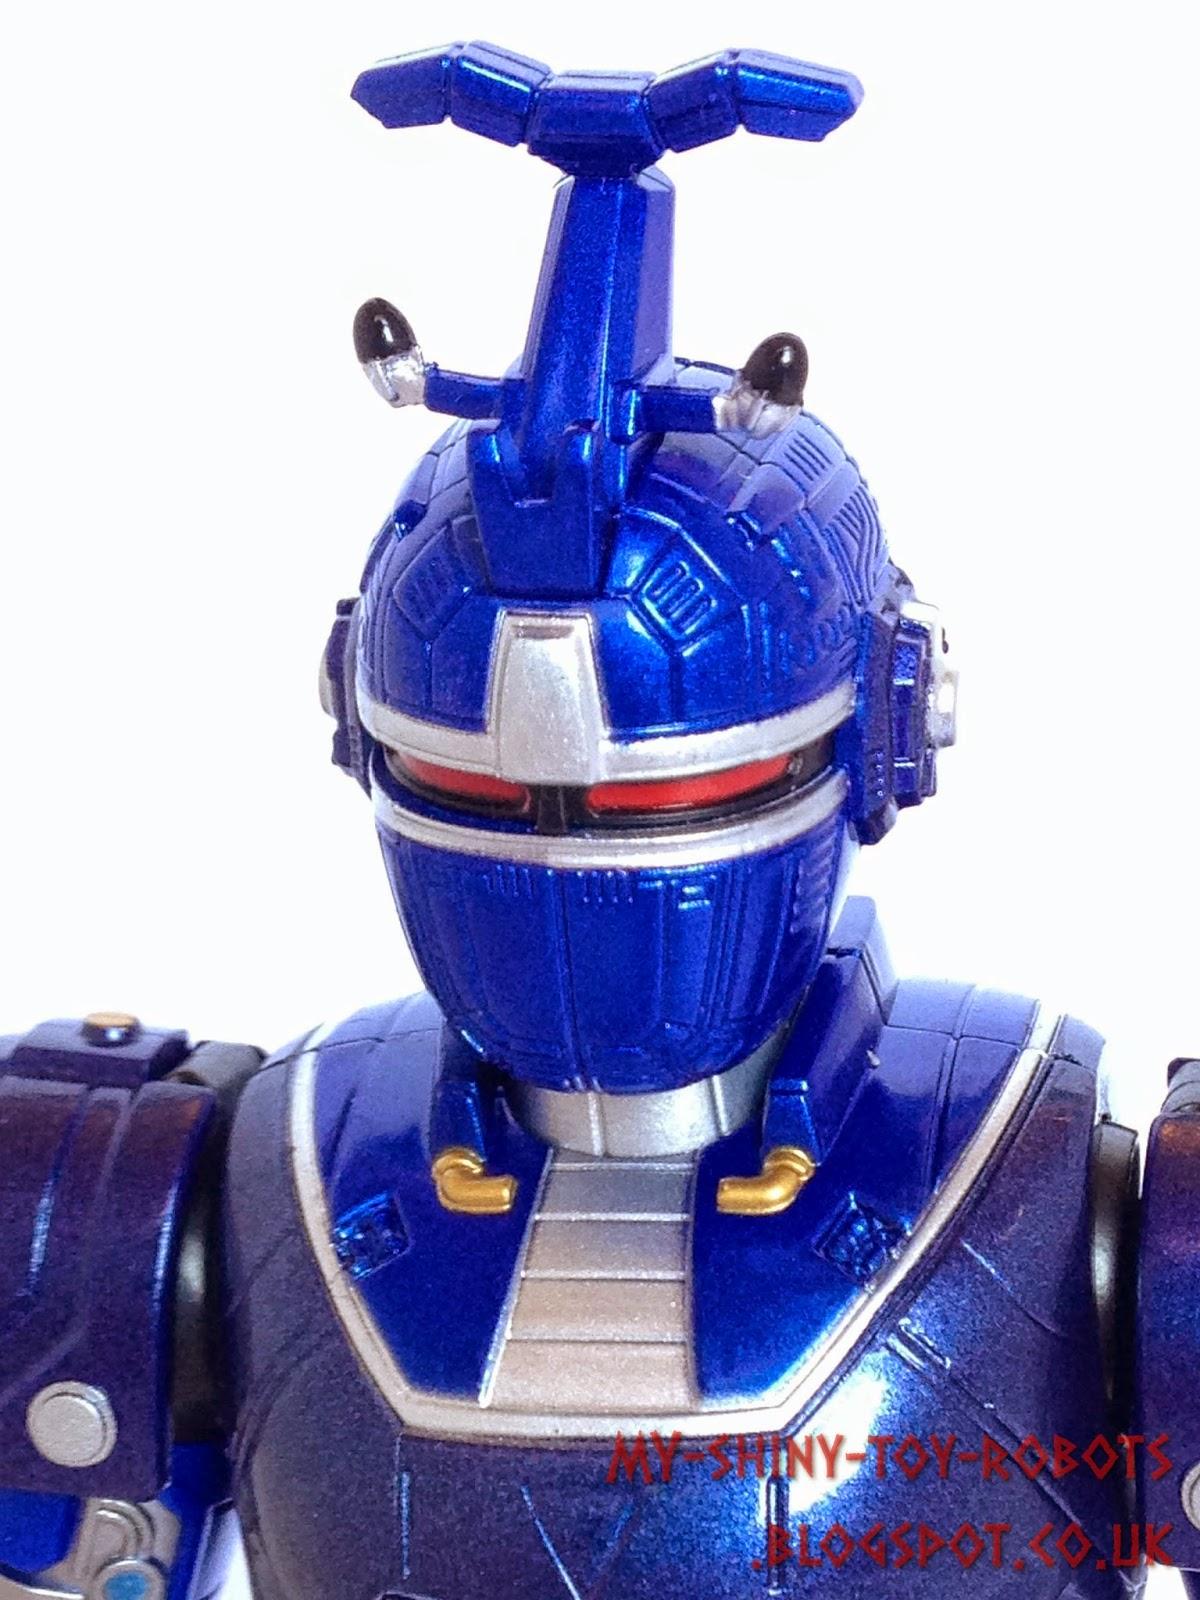 S.H. Figuarts Blue Beet